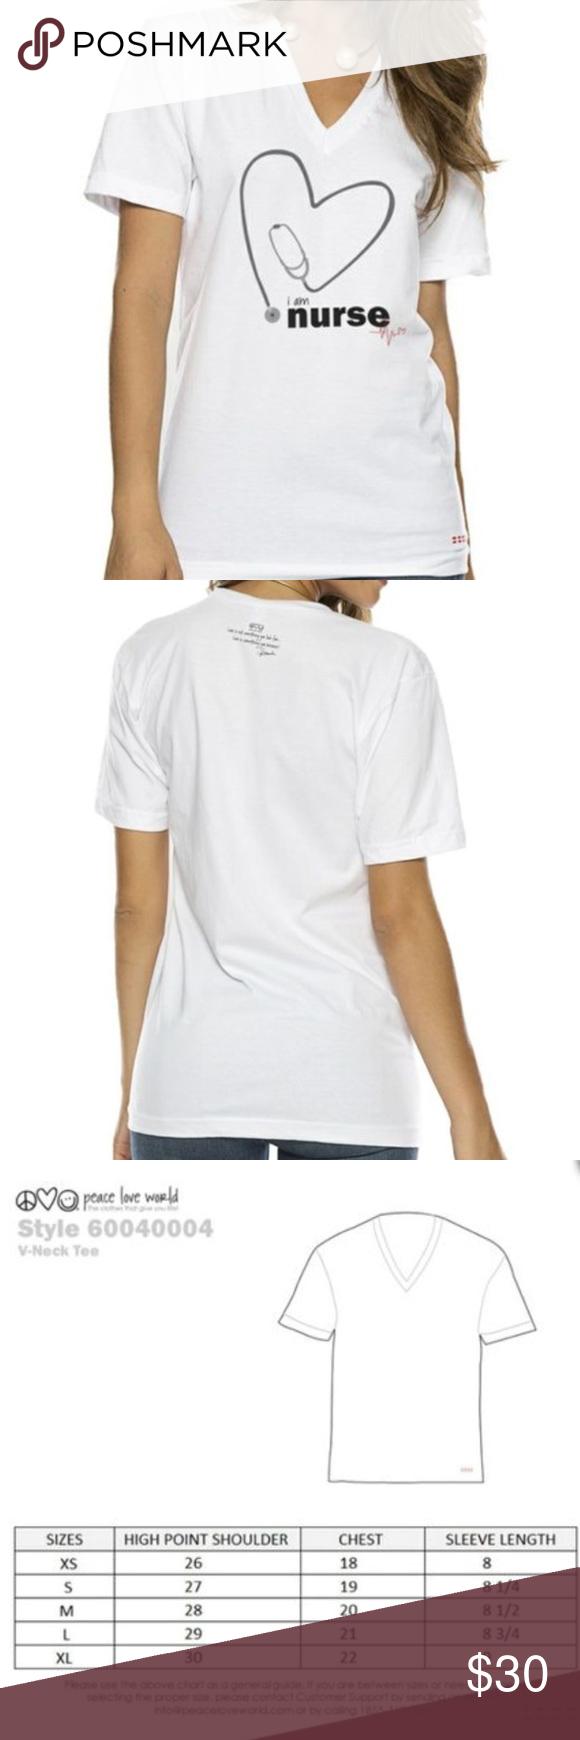 Nwt I Am Nurse T Shirt Peace Love World Size Large Still In